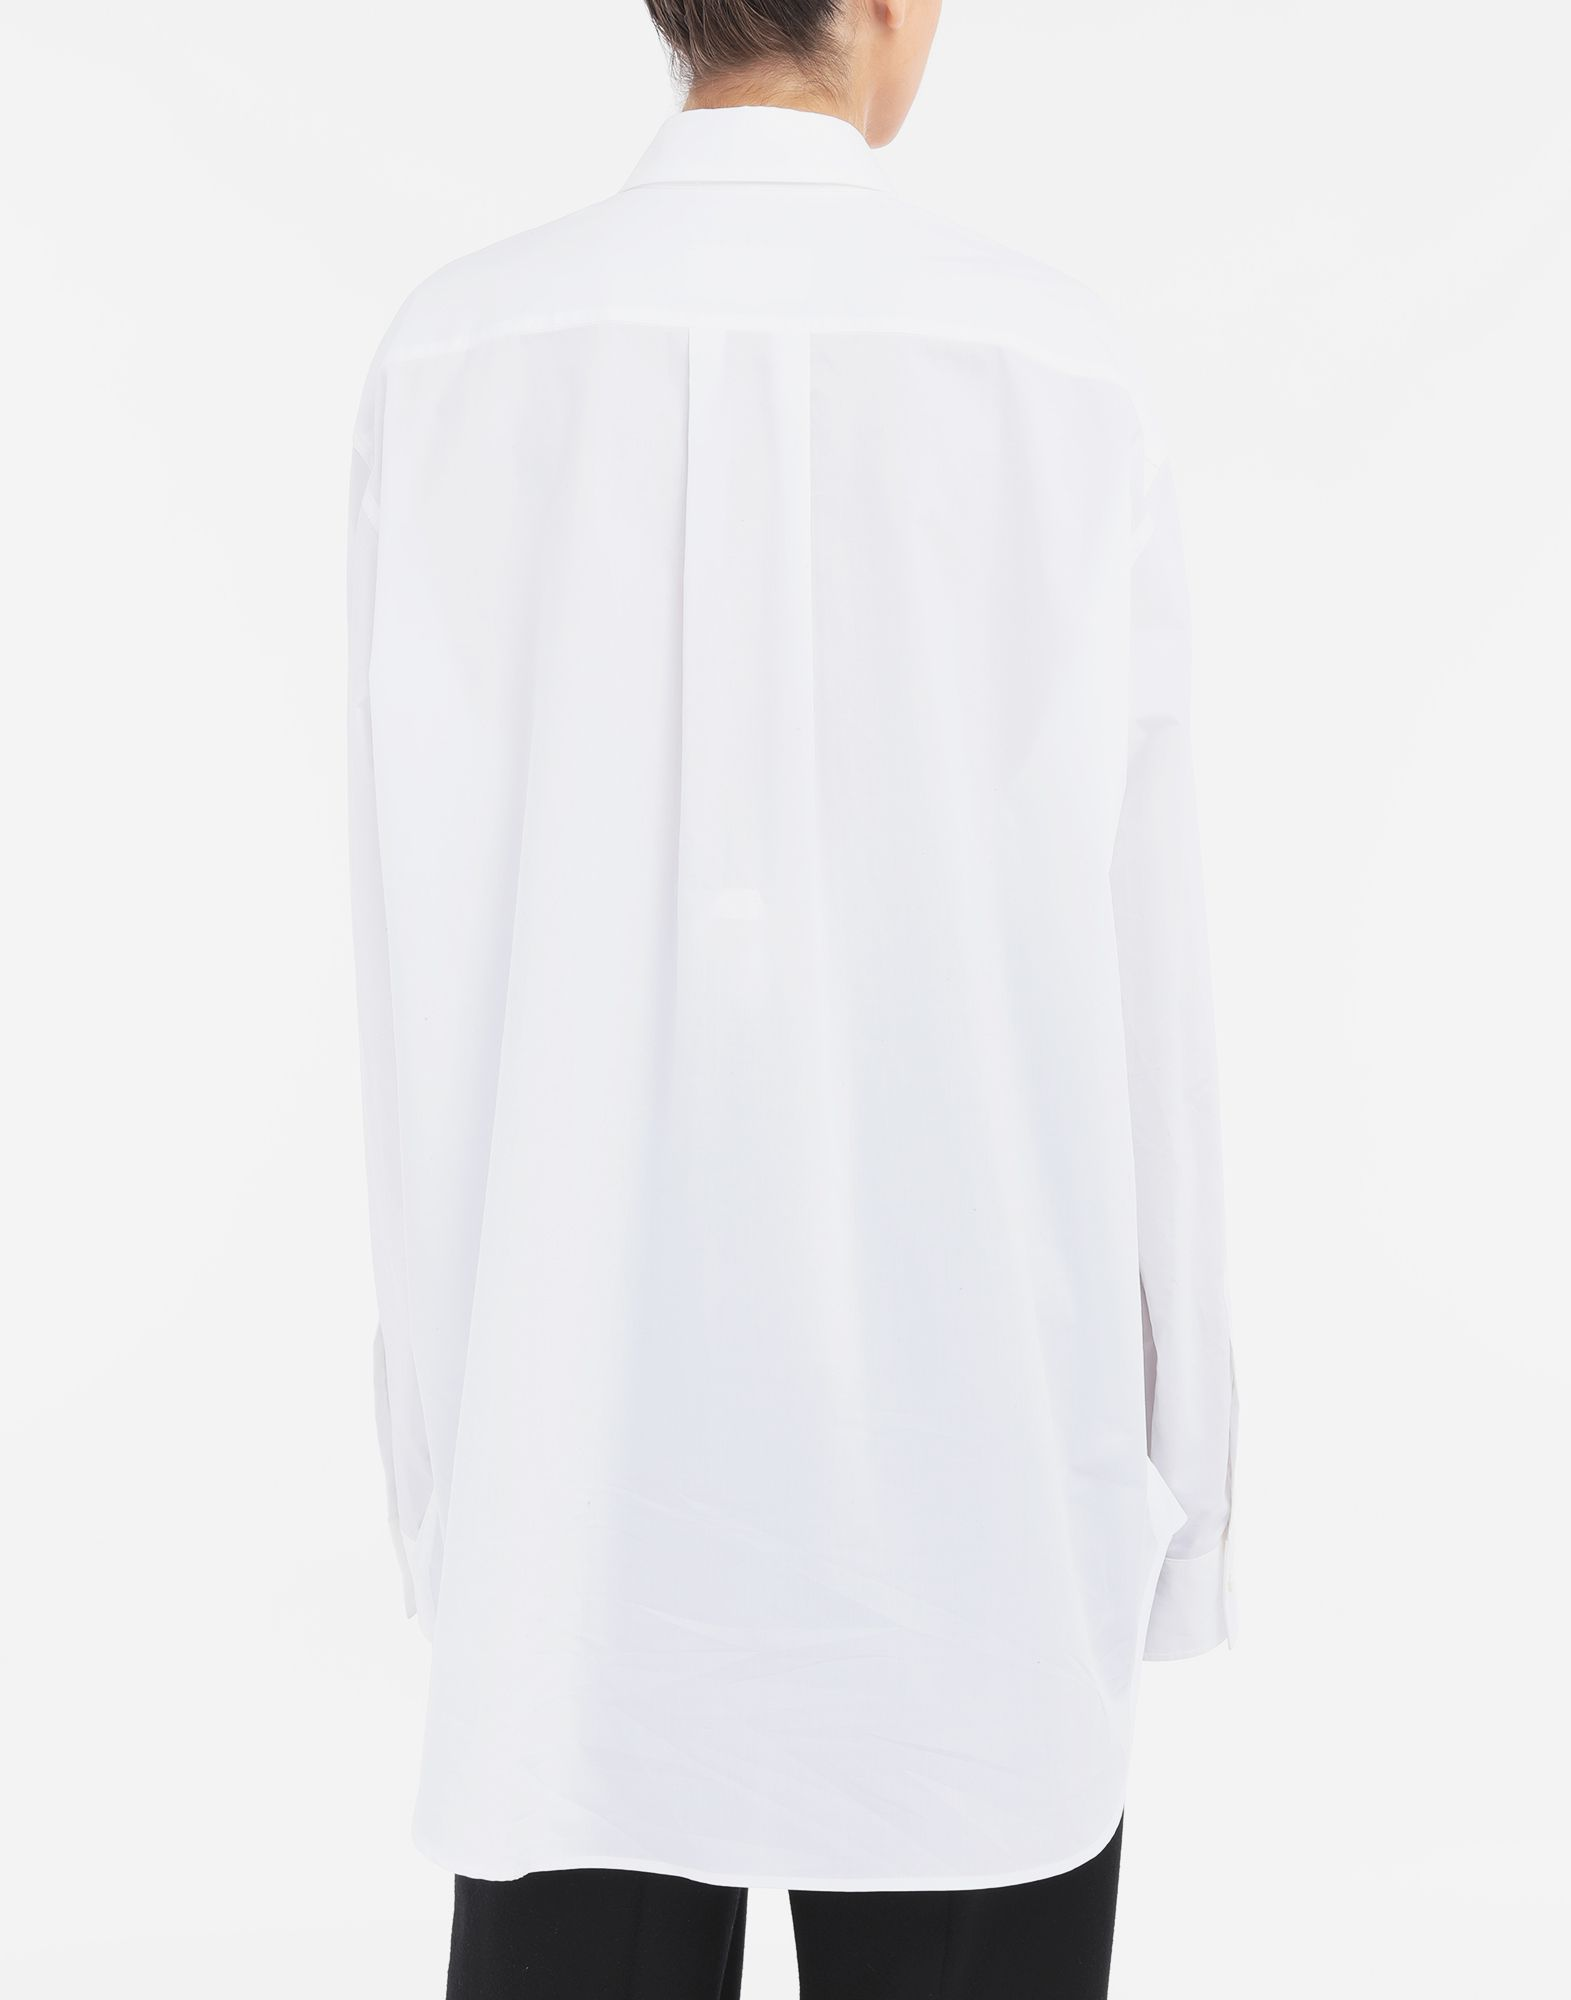 MM6 MAISON MARGIELA Multi-wear shirt Long sleeve shirt Woman e